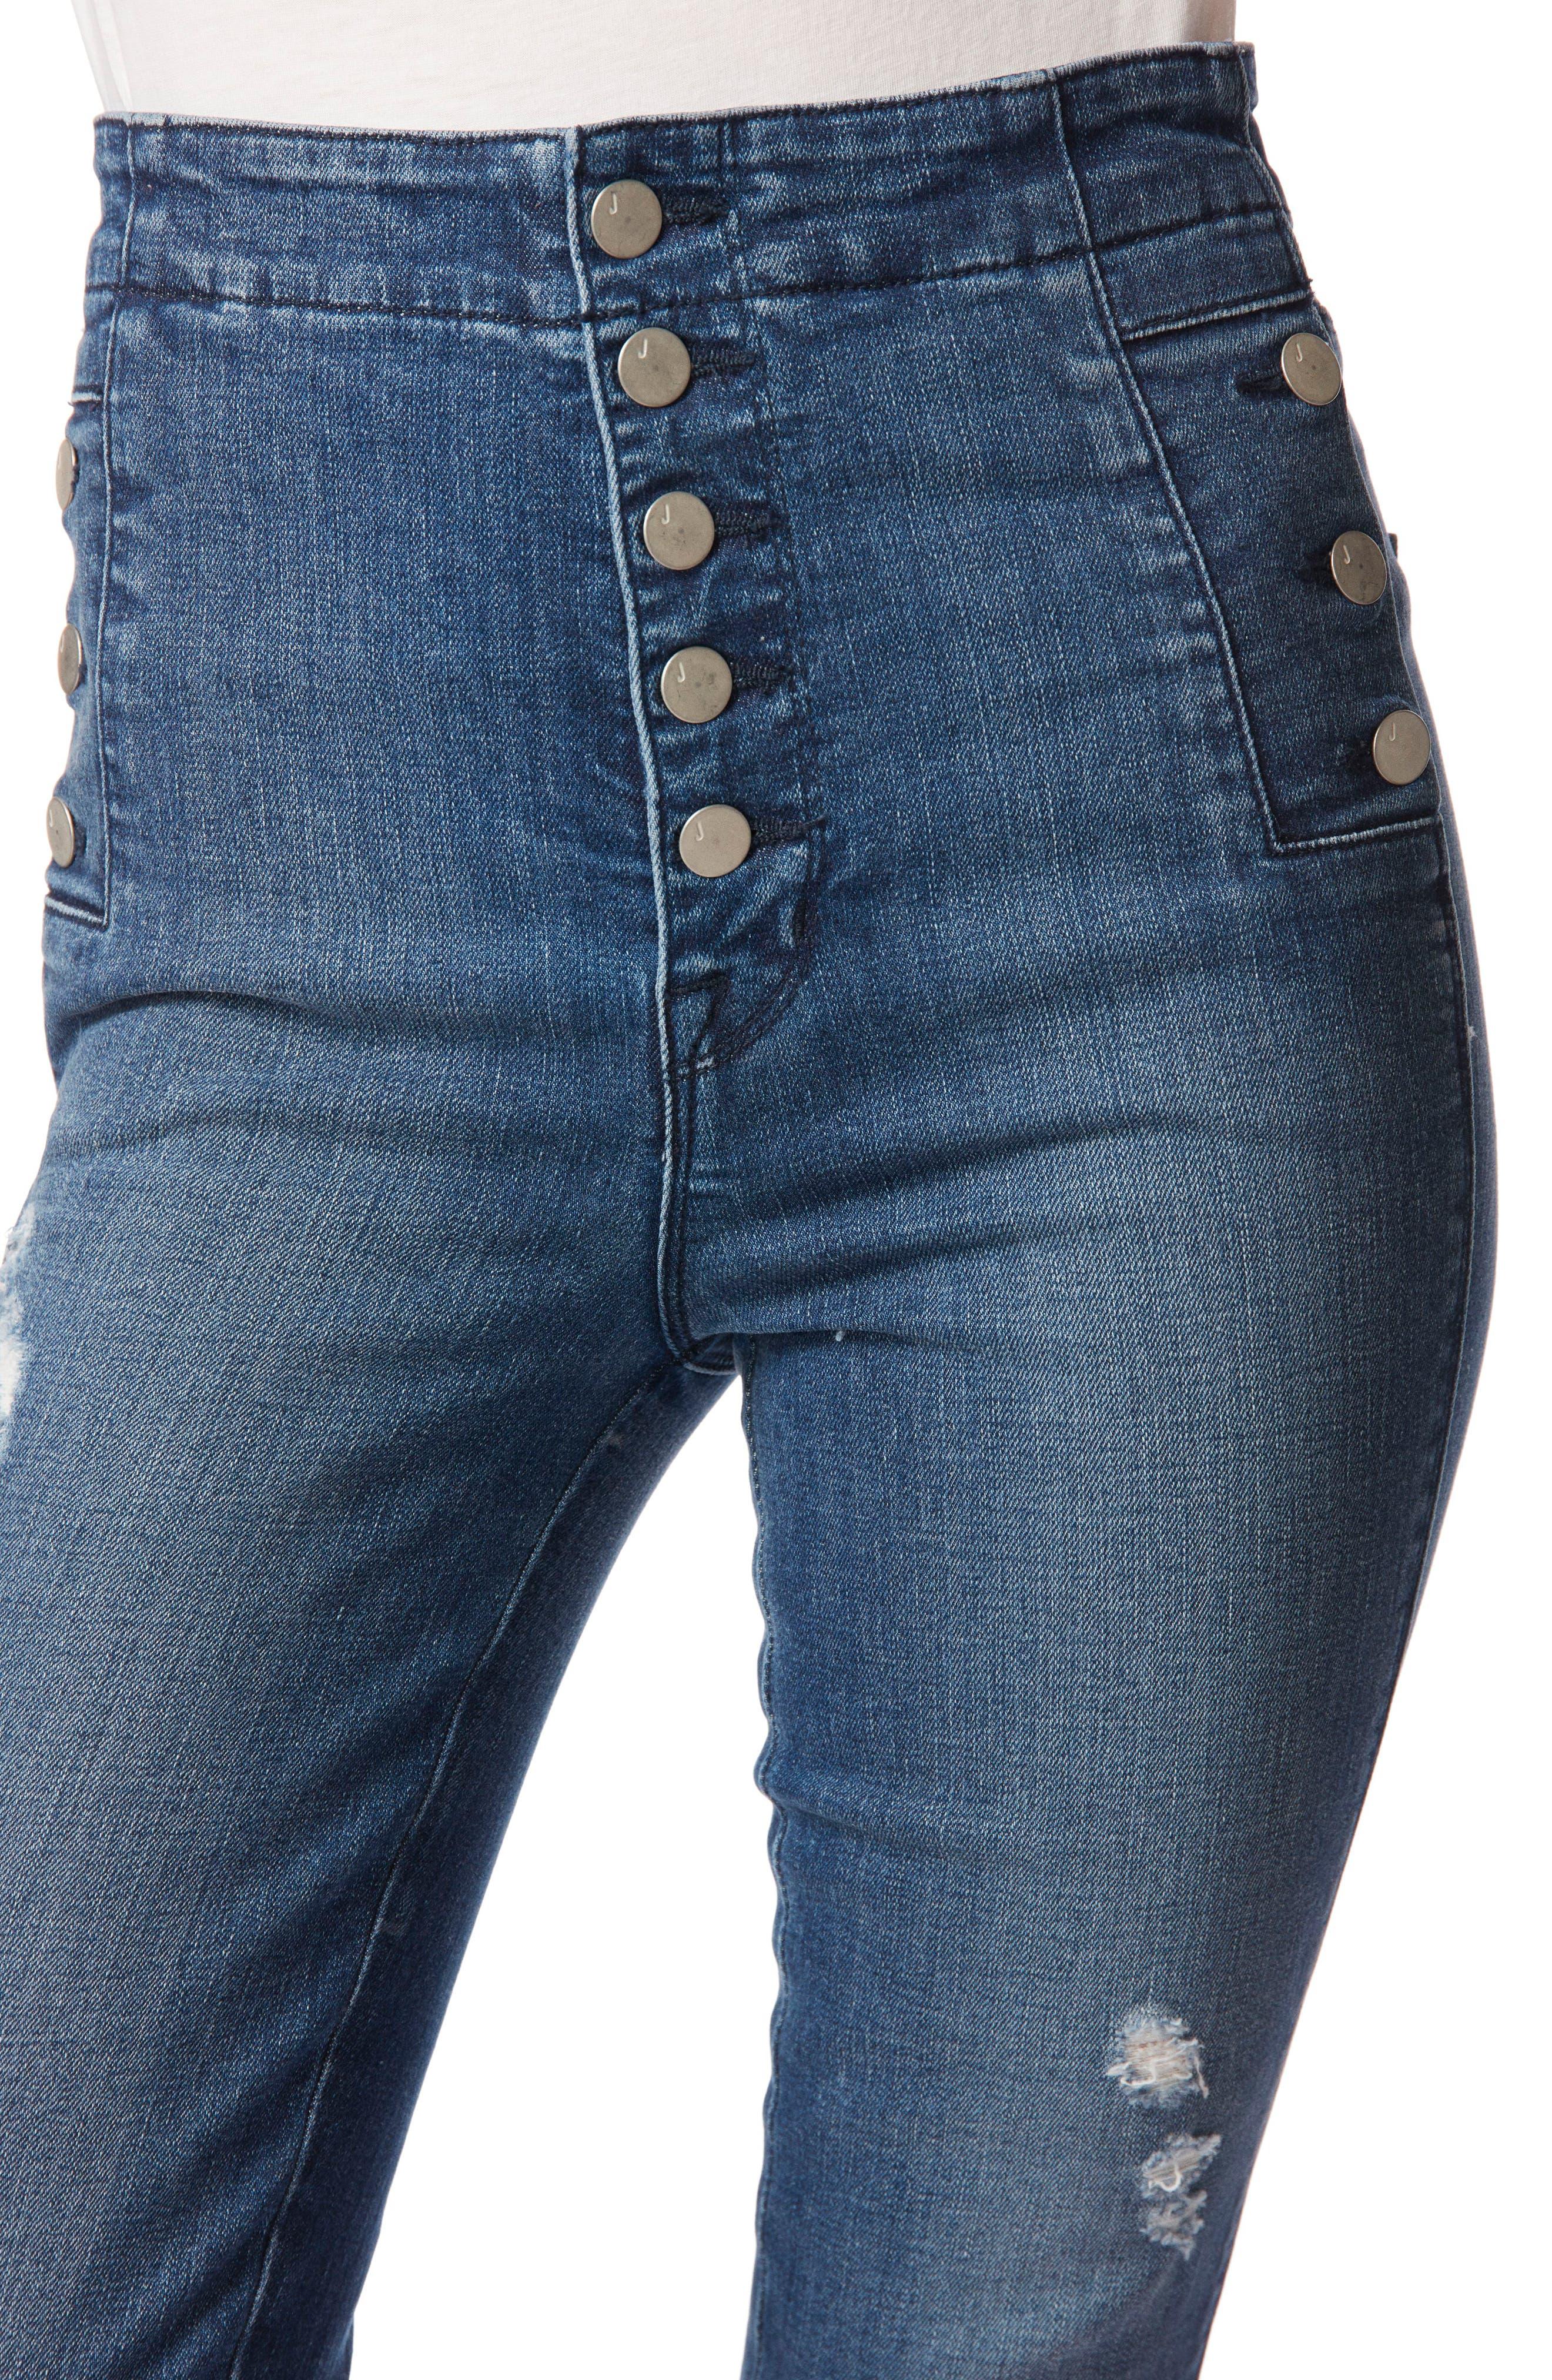 Natasha Sky High High Waist Skinny Jeans,                             Alternate thumbnail 4, color,                             234